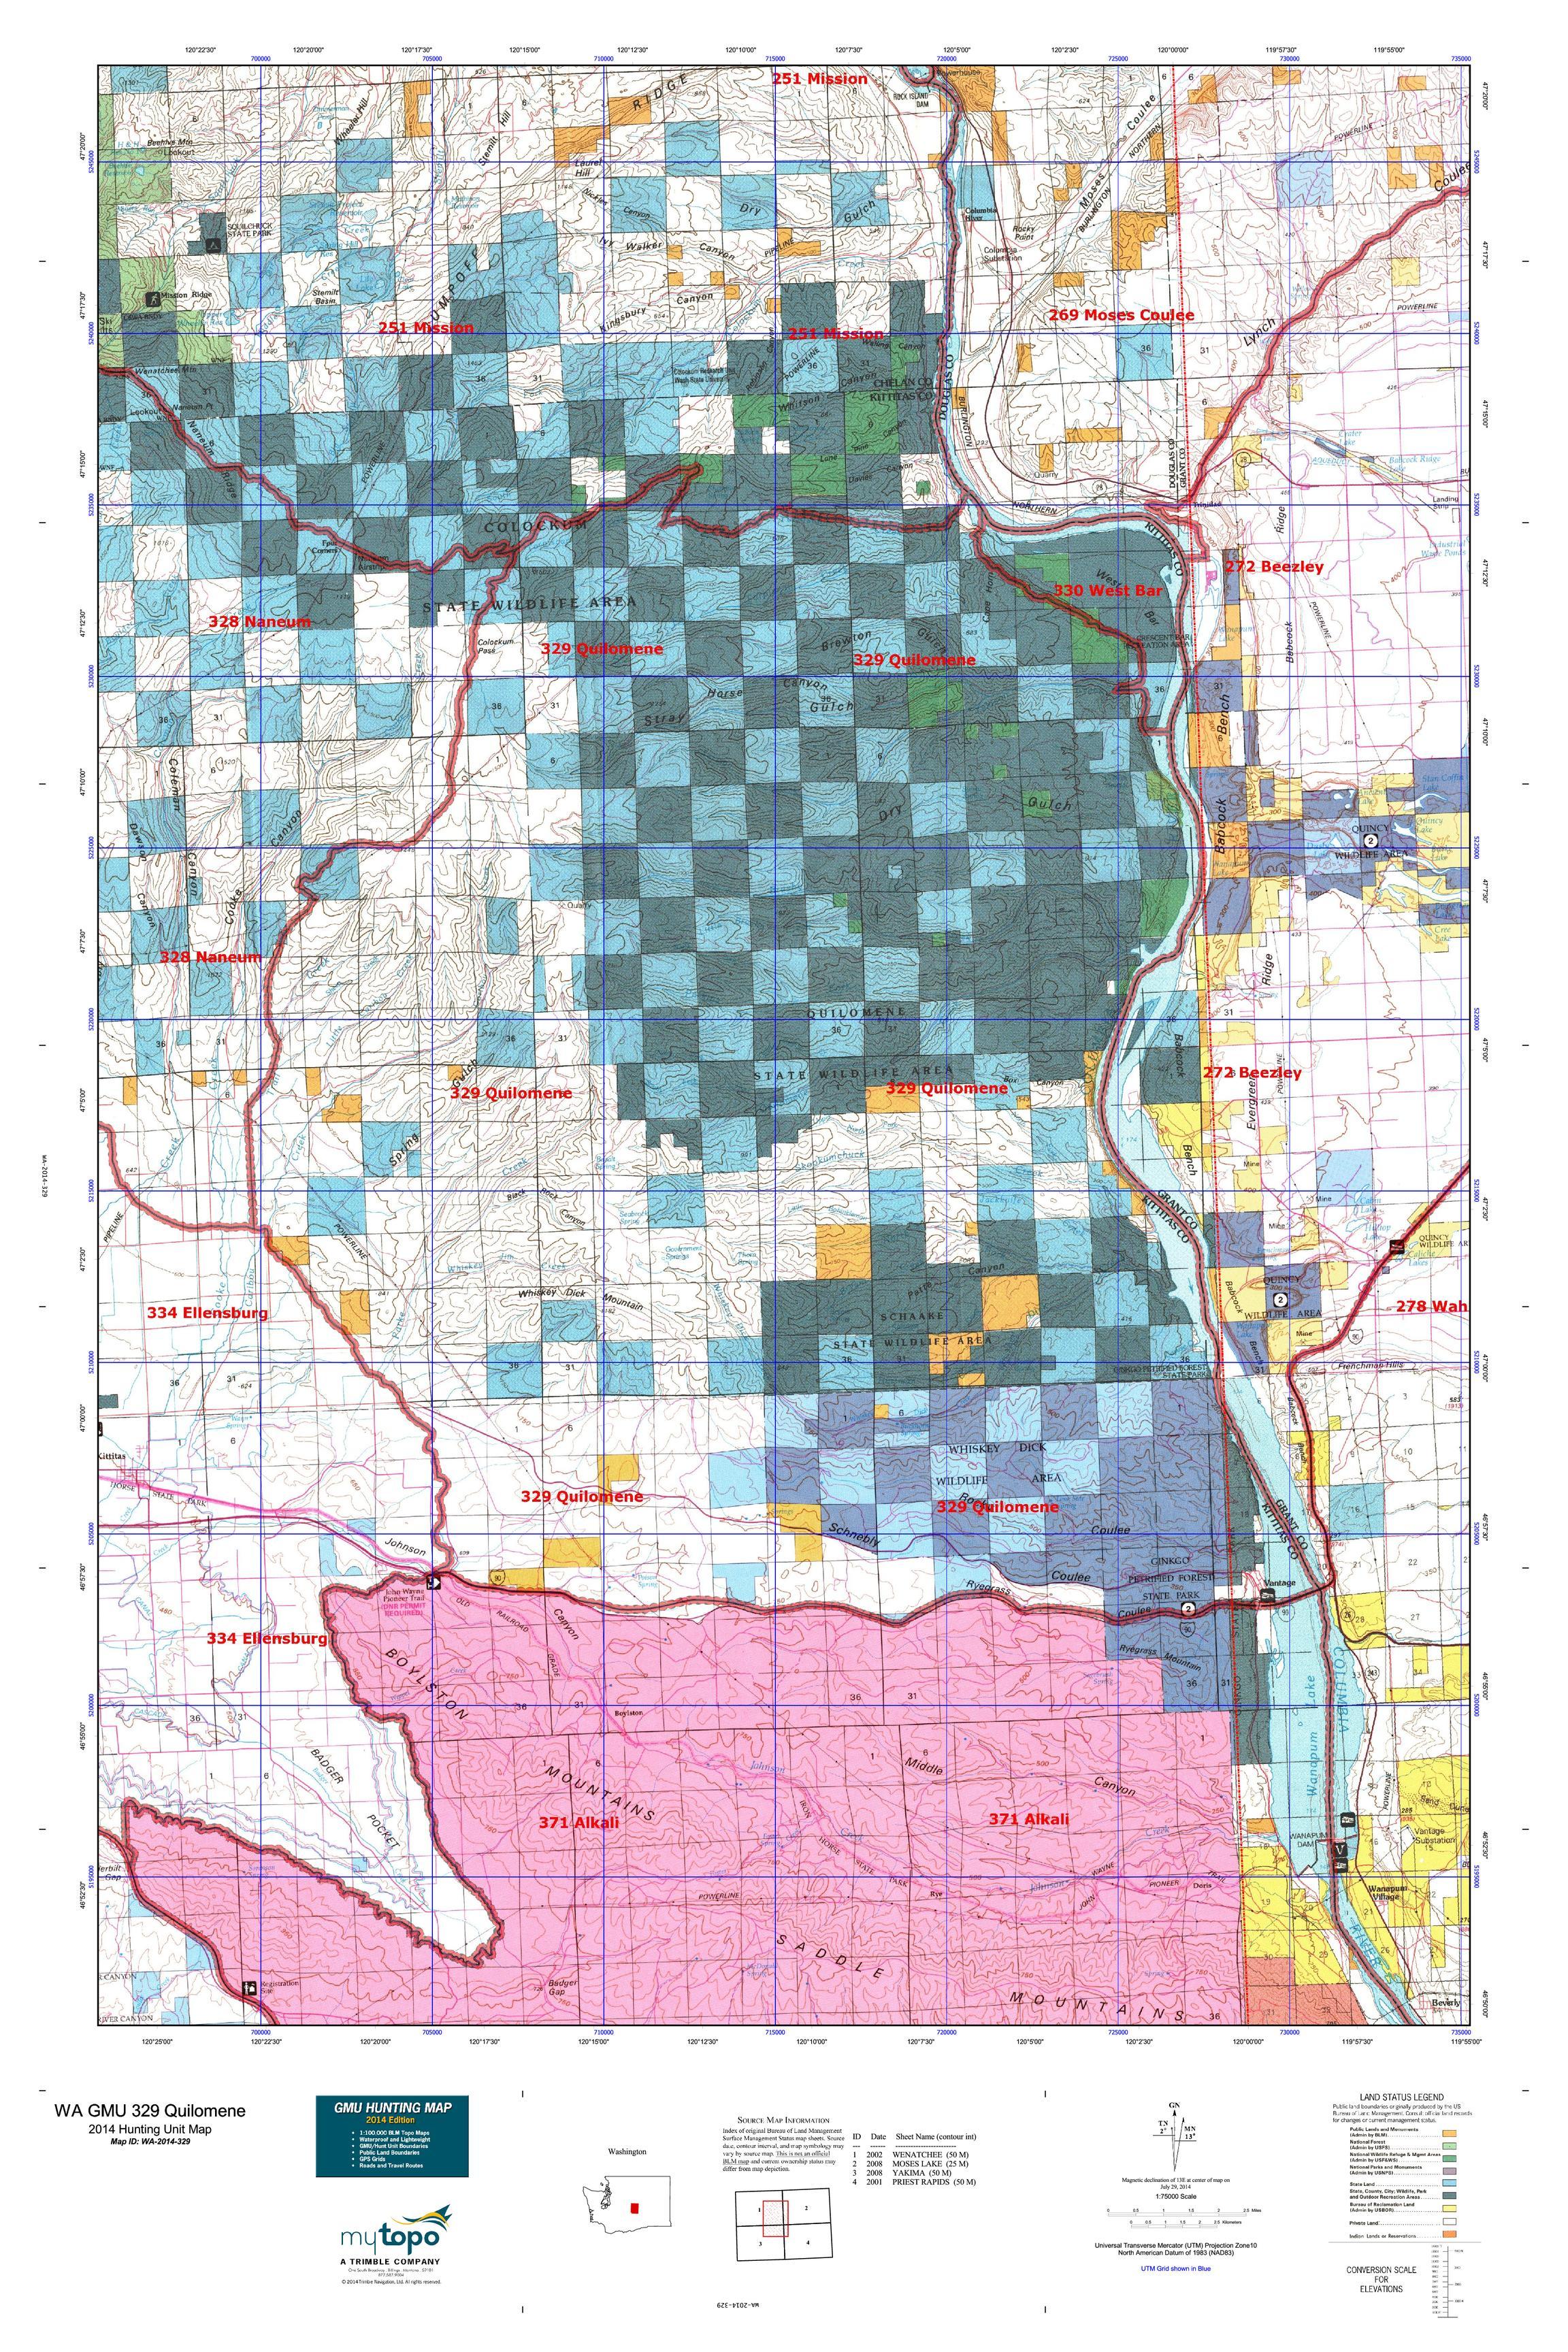 21 elegant Washington Hunting Gmu Map – bnhspine.com